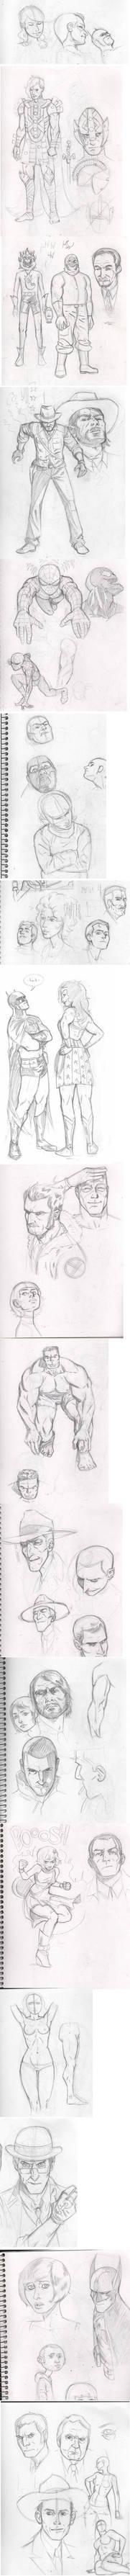 Sketchdump 27